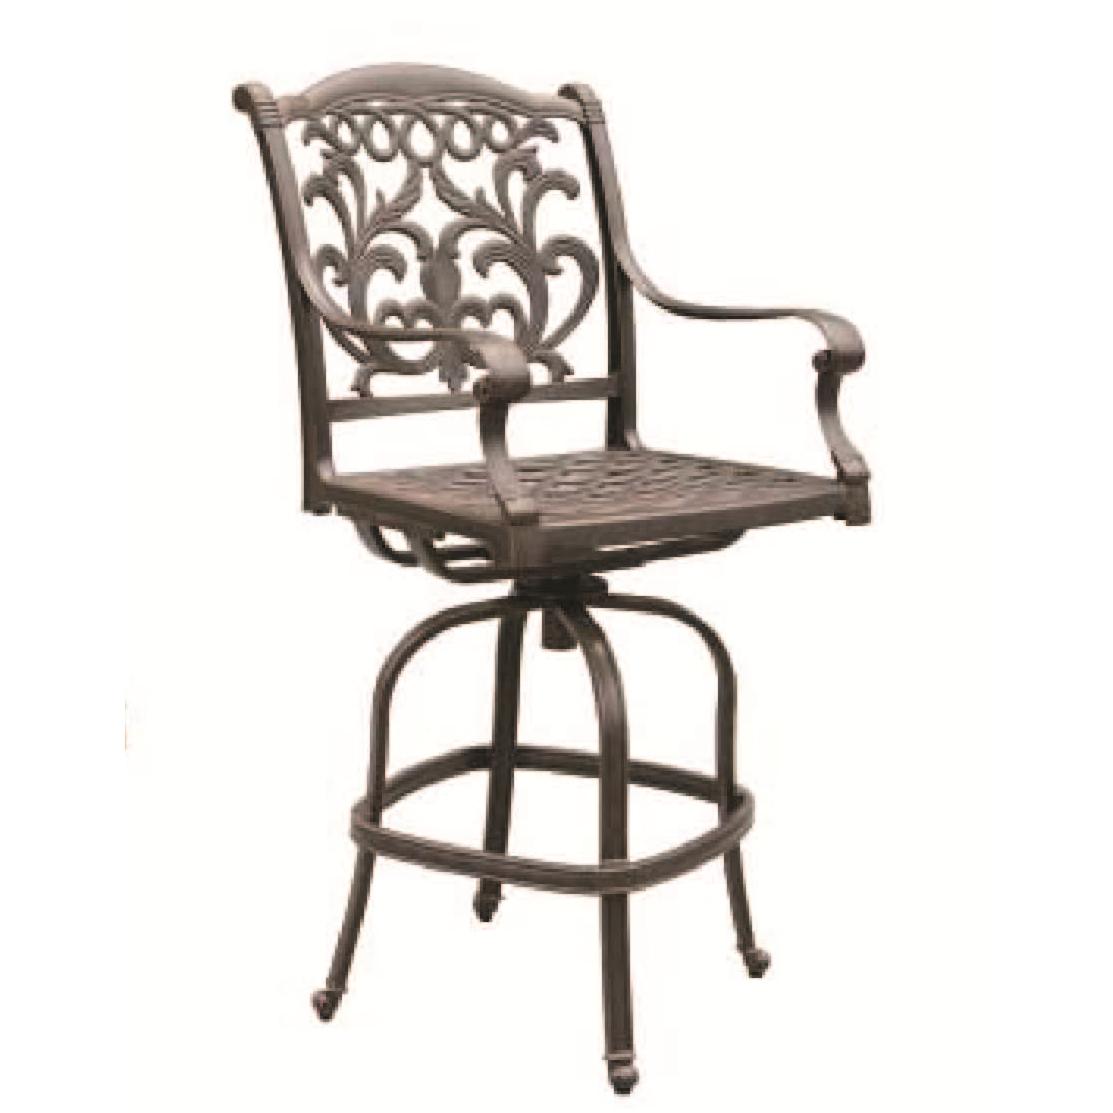 31 wonderful patio chairs aluminum